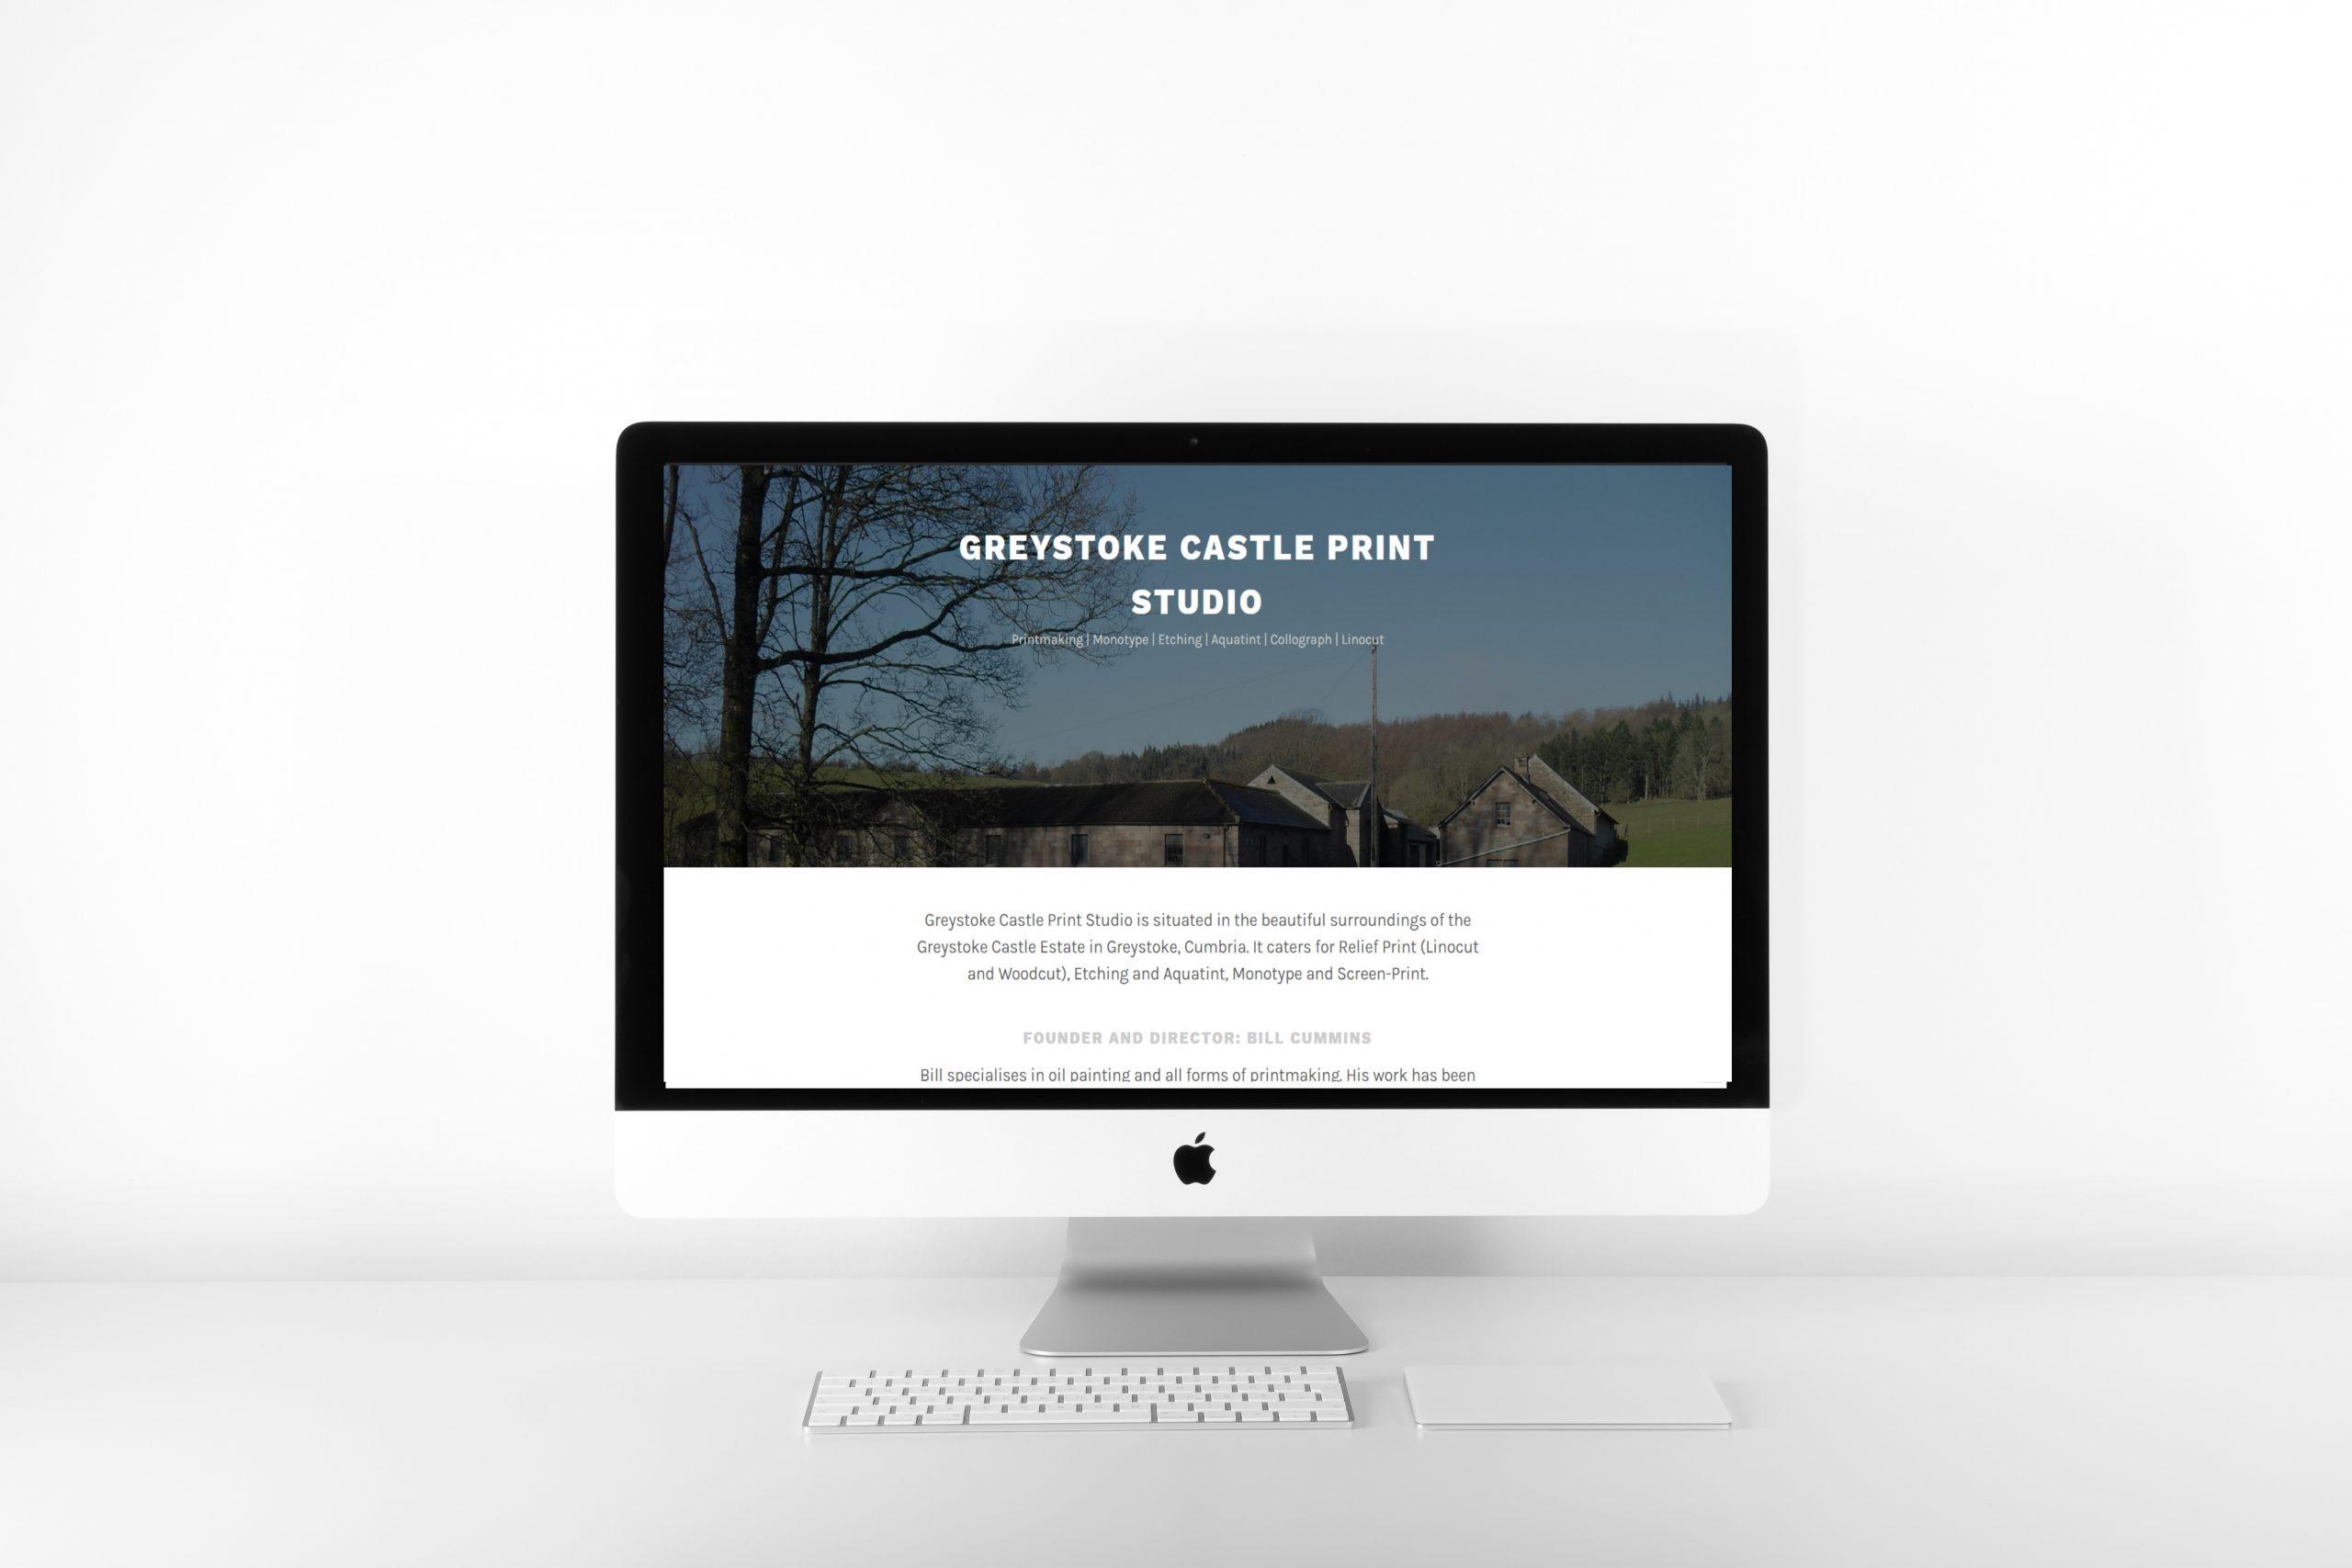 Greystoke Castle Print Studio Home Page WordPress Website Design